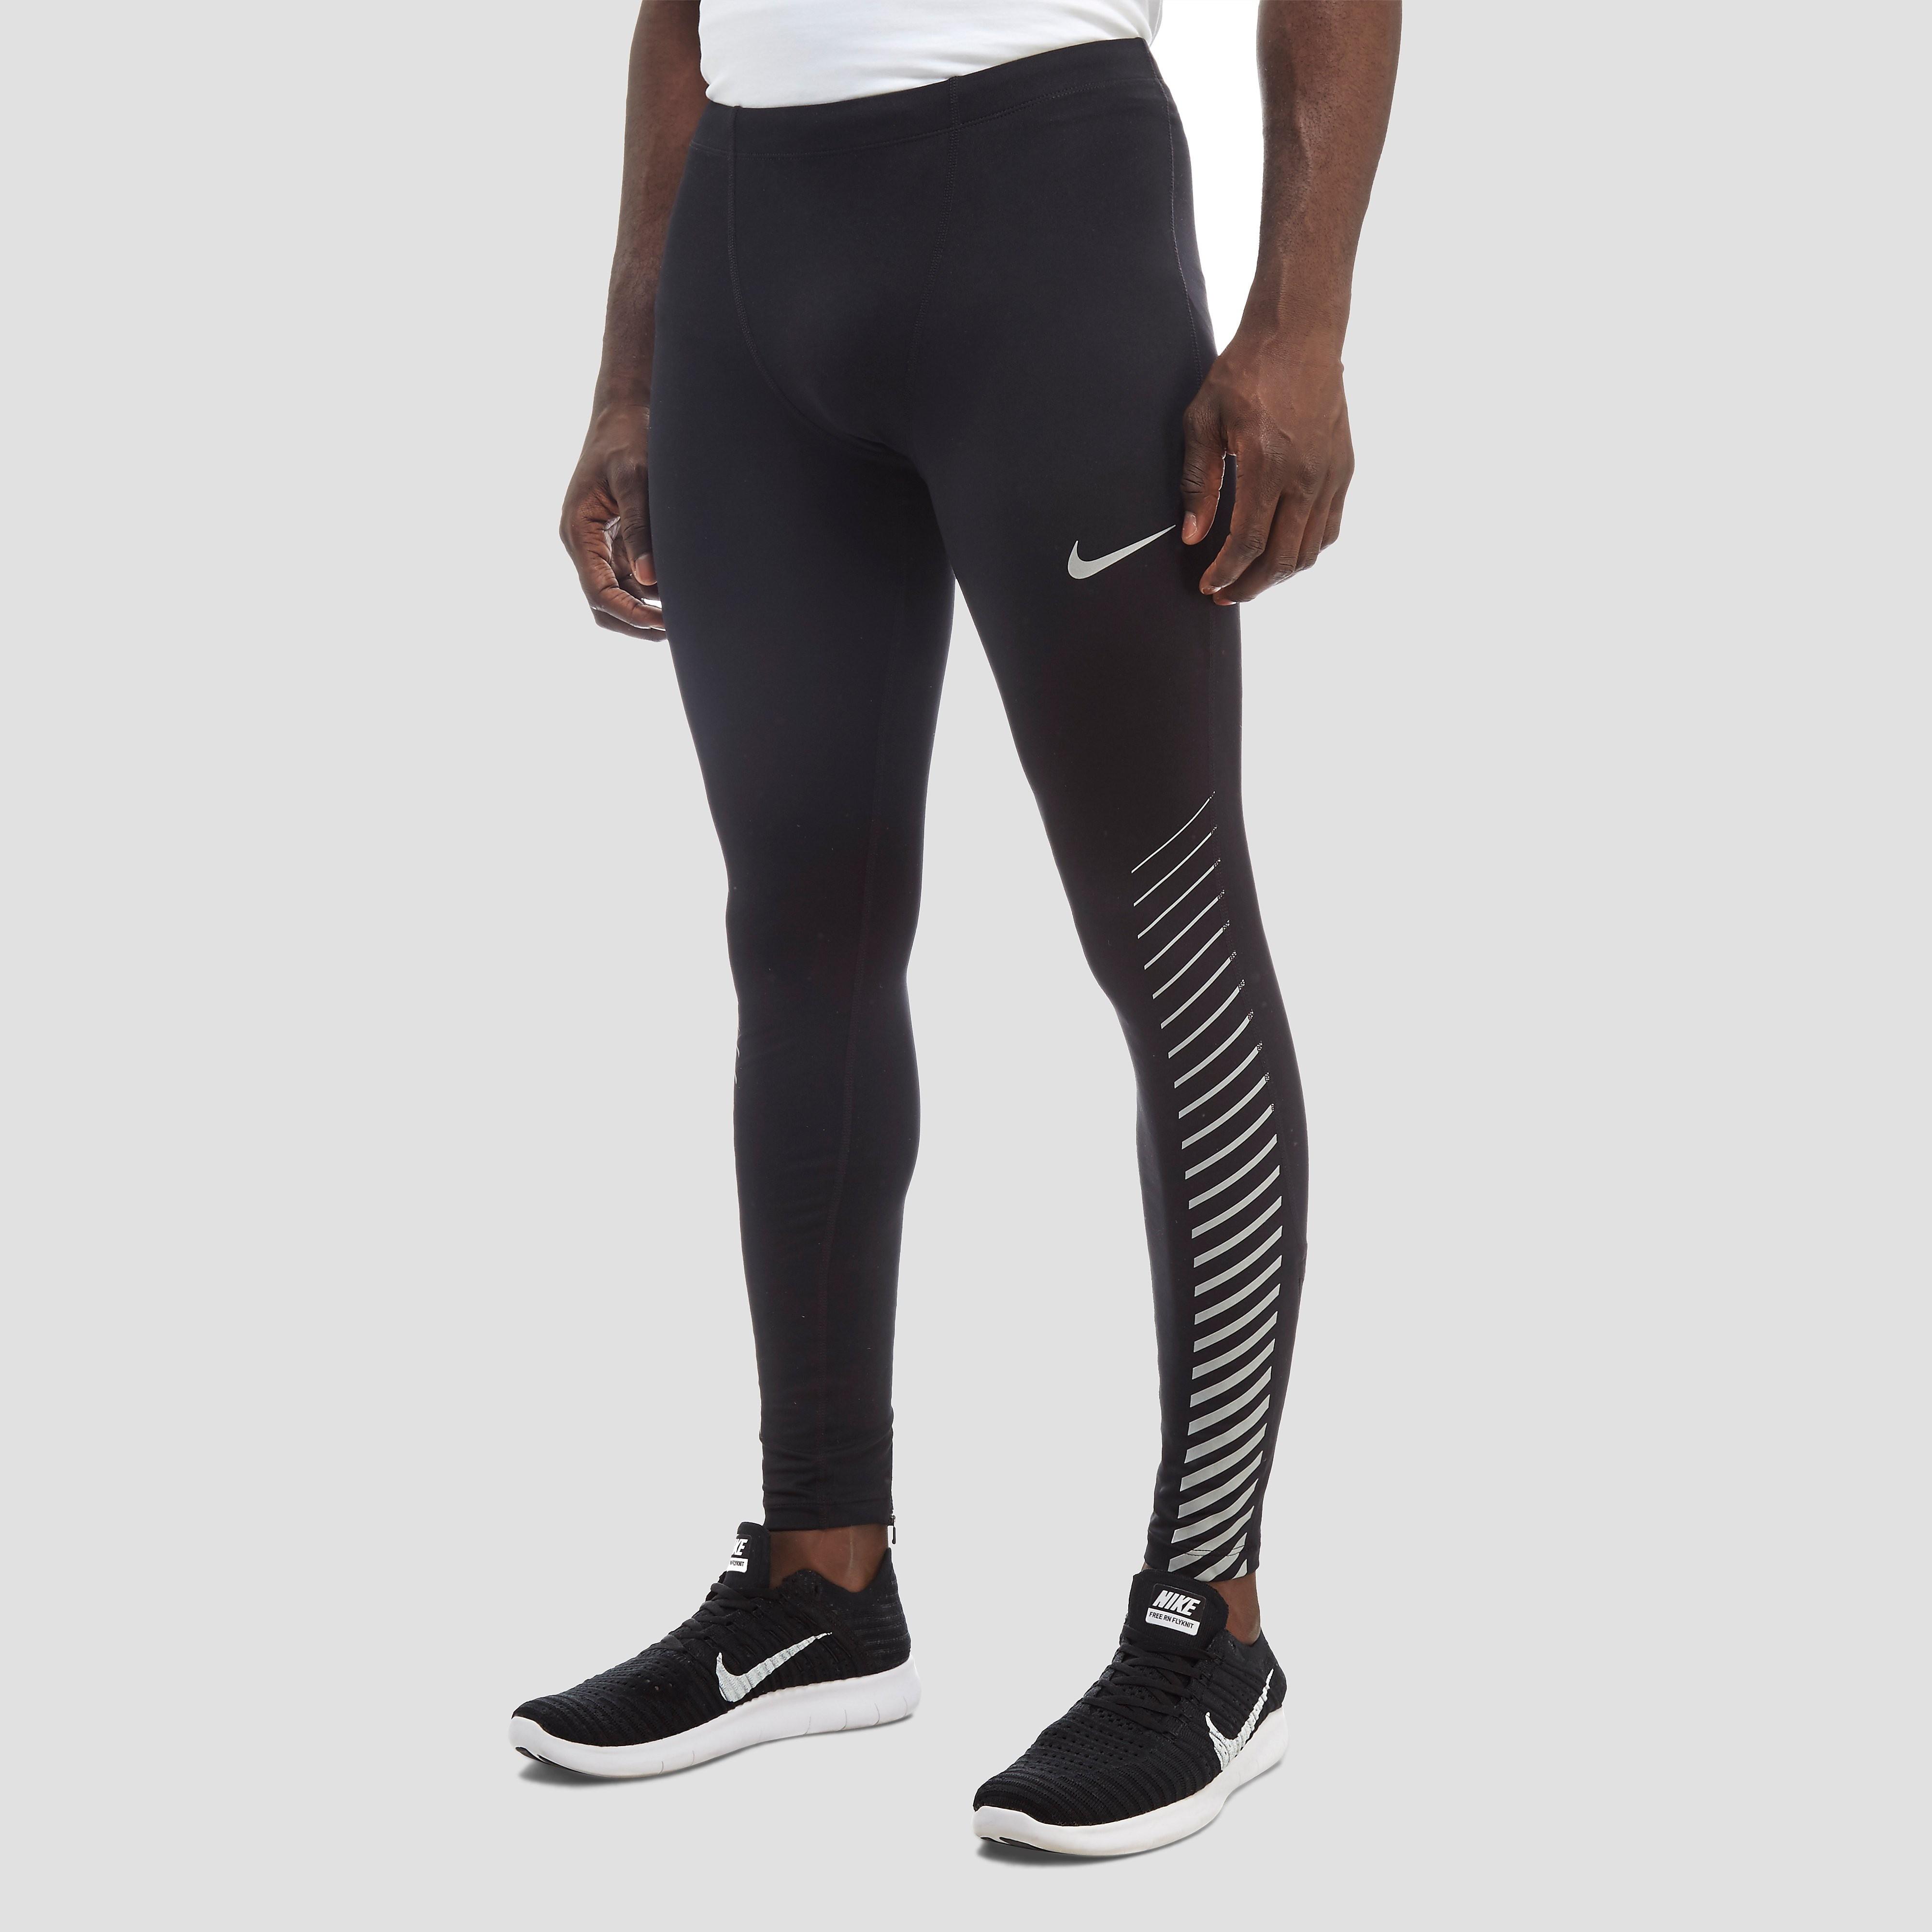 Nike Flash GPX Men's Tights